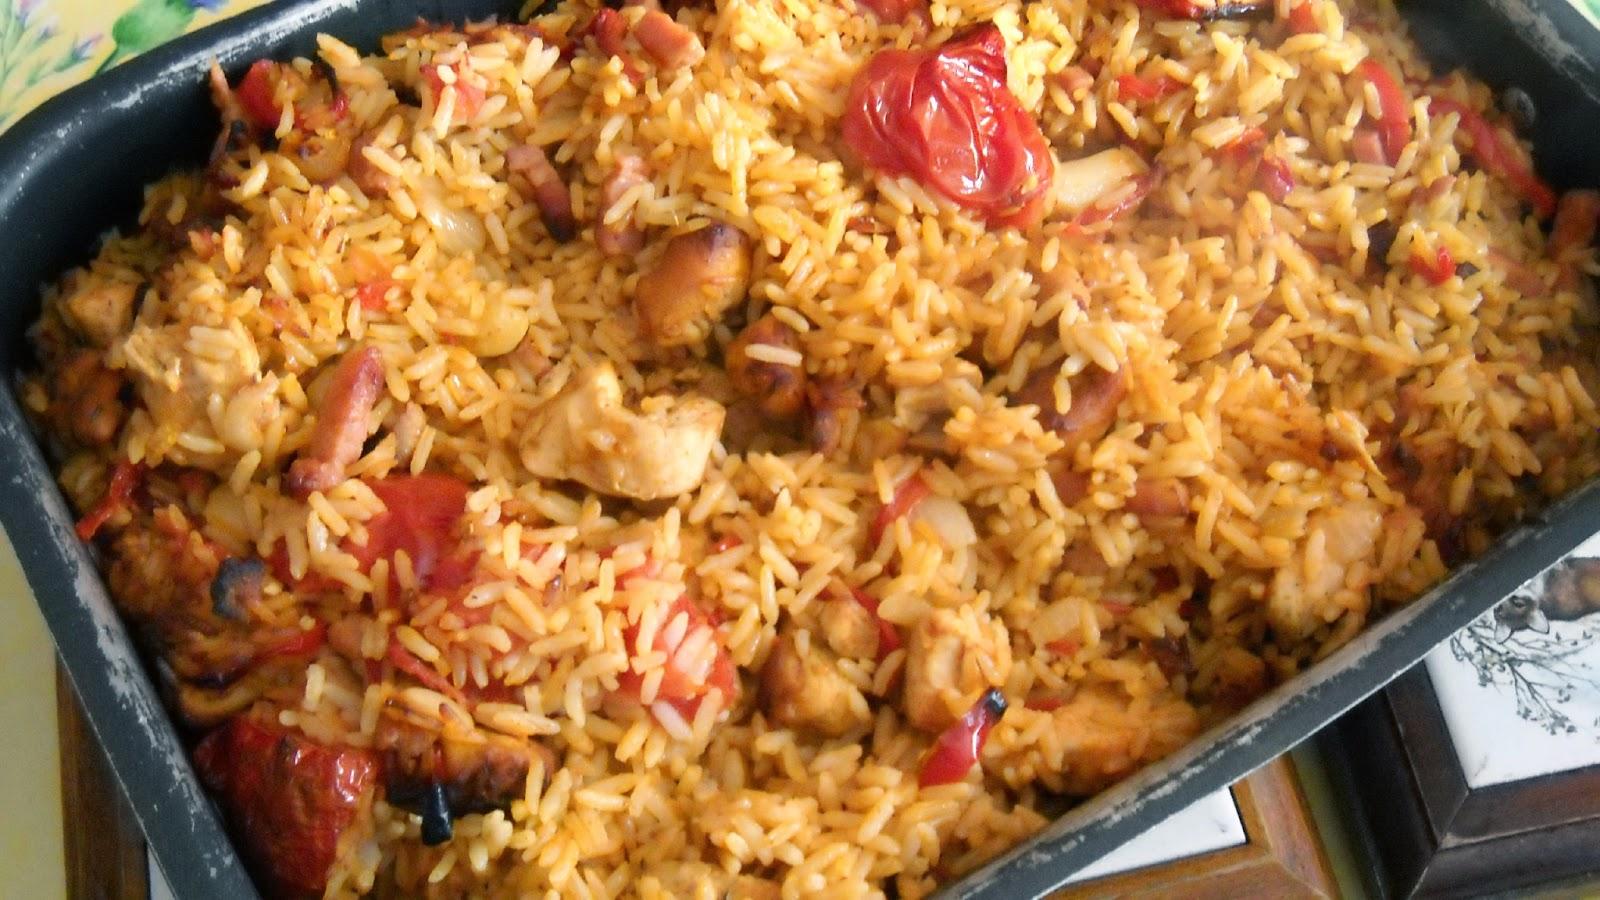 receta de cocina,cocina hecha en casa, recetas de cocina,comidas hecha con recetas